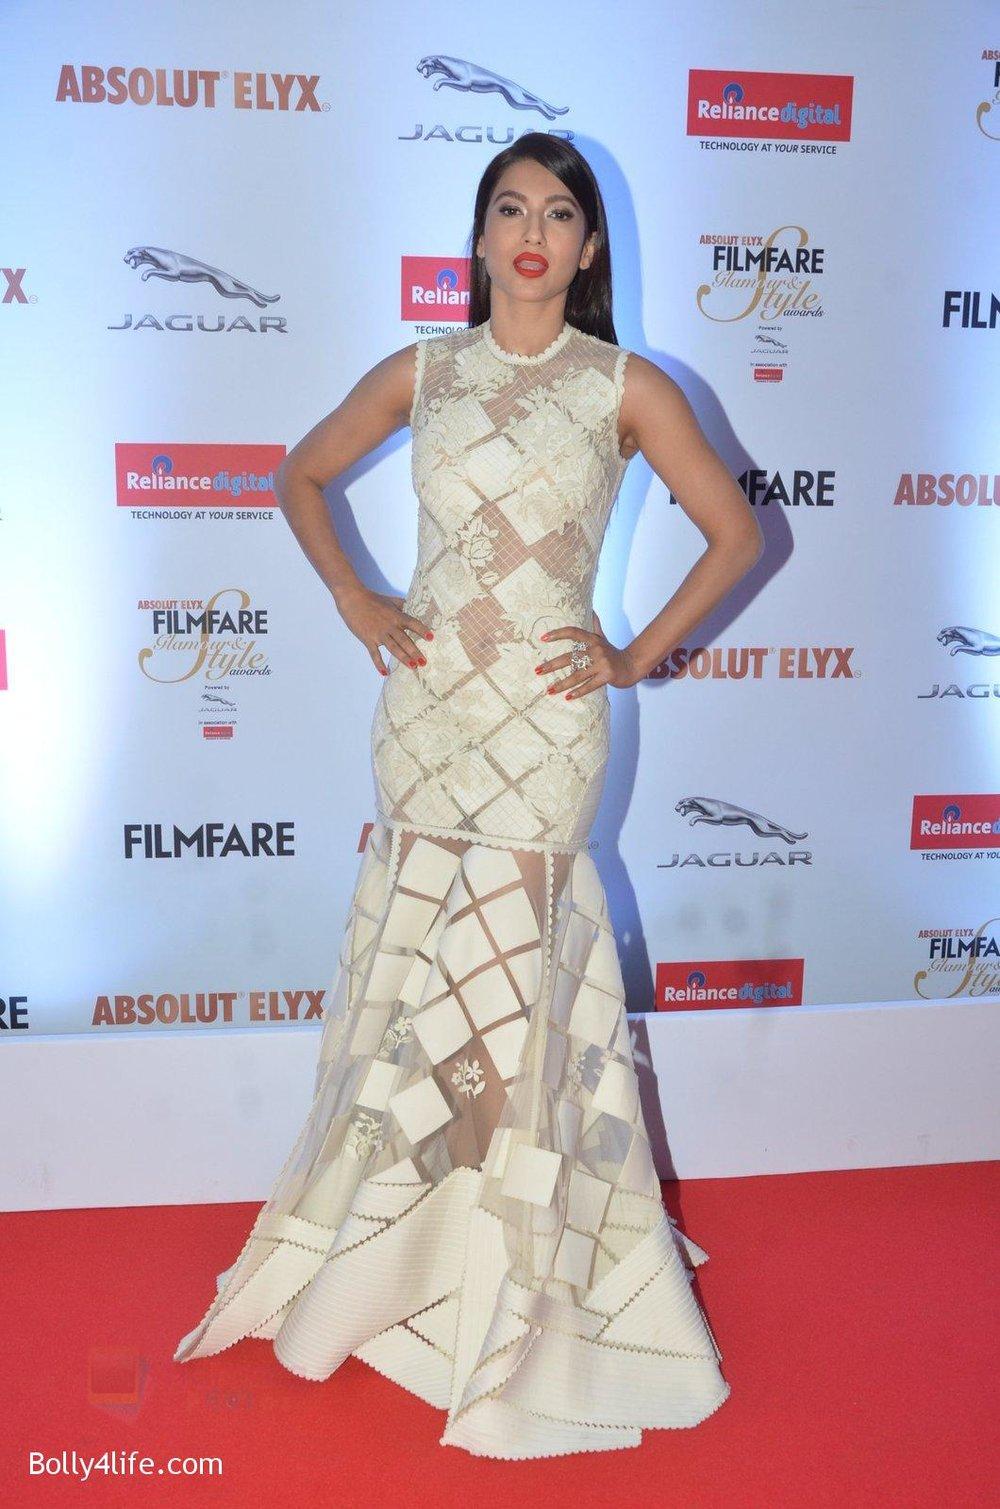 Gauhar-Khan-at-Filmfare-Glamour-Style-Awards-2016-in-Mumbai-on-15th-Oct-2016-1133.jpg